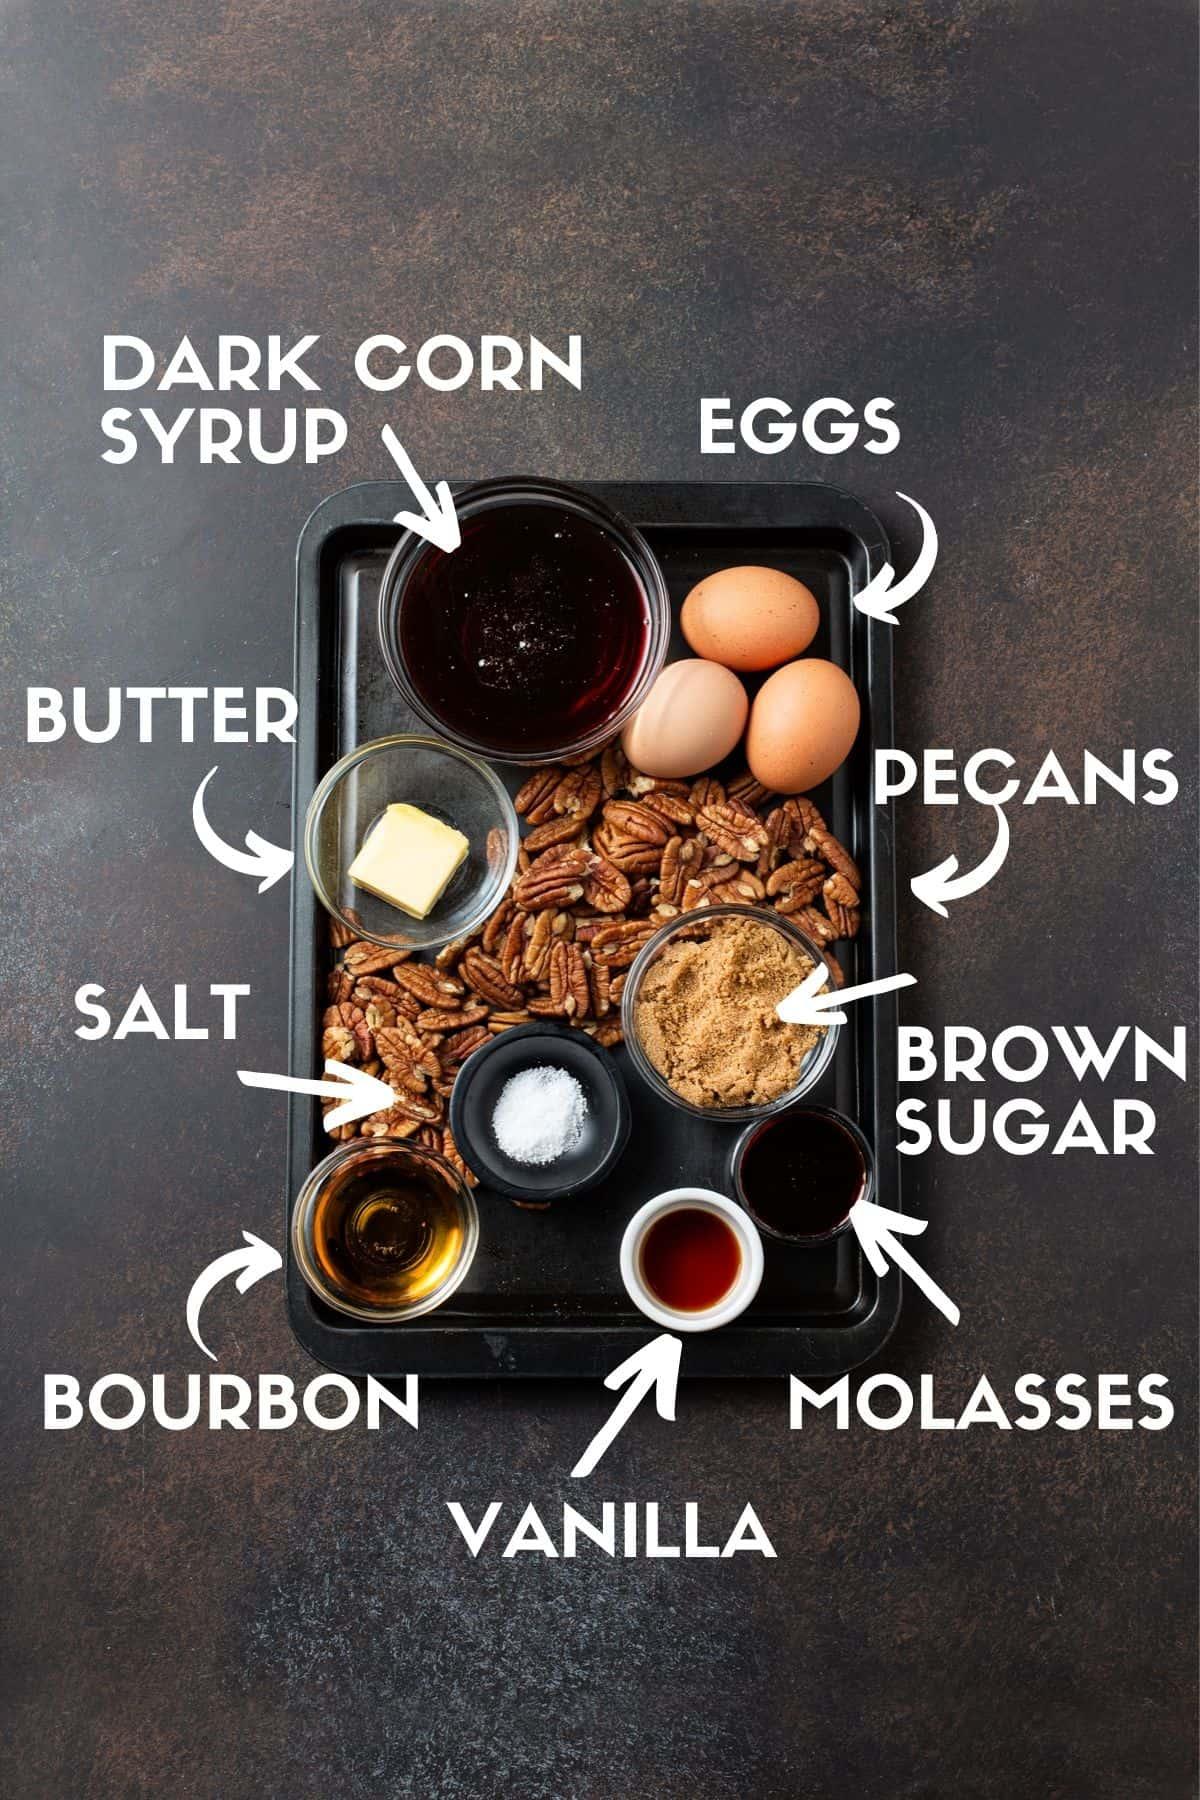 Diagram of ingredients for pecan pie.